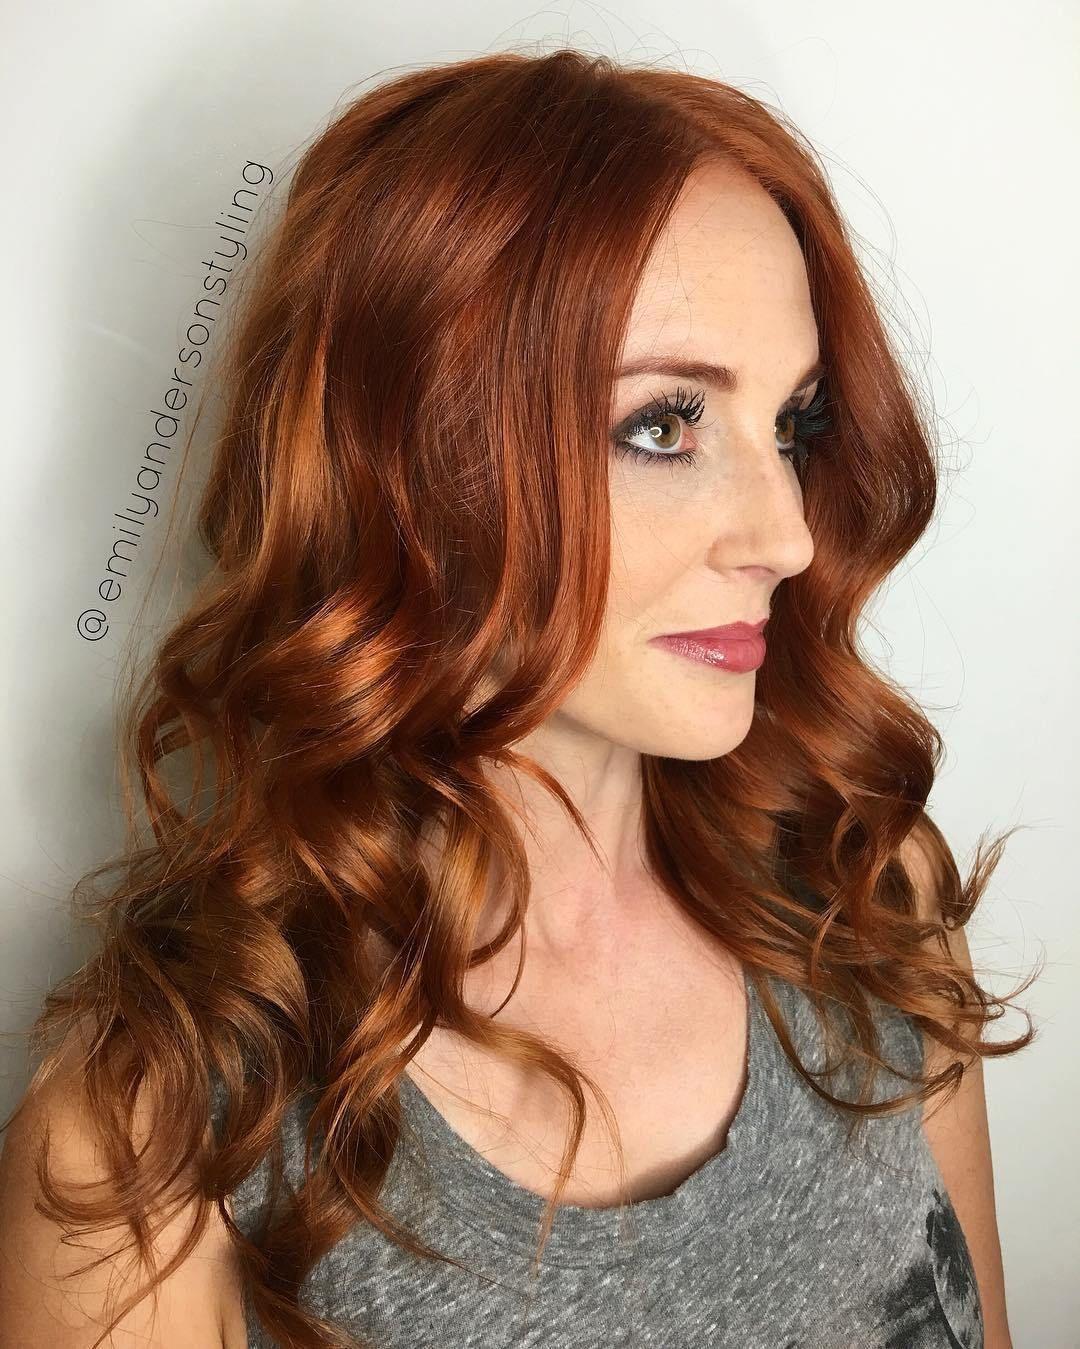 Choosing A Hair Color For Your Skin Tone Hair Color Auburn Red Hair Olive Skin Skin Tone Hair Color